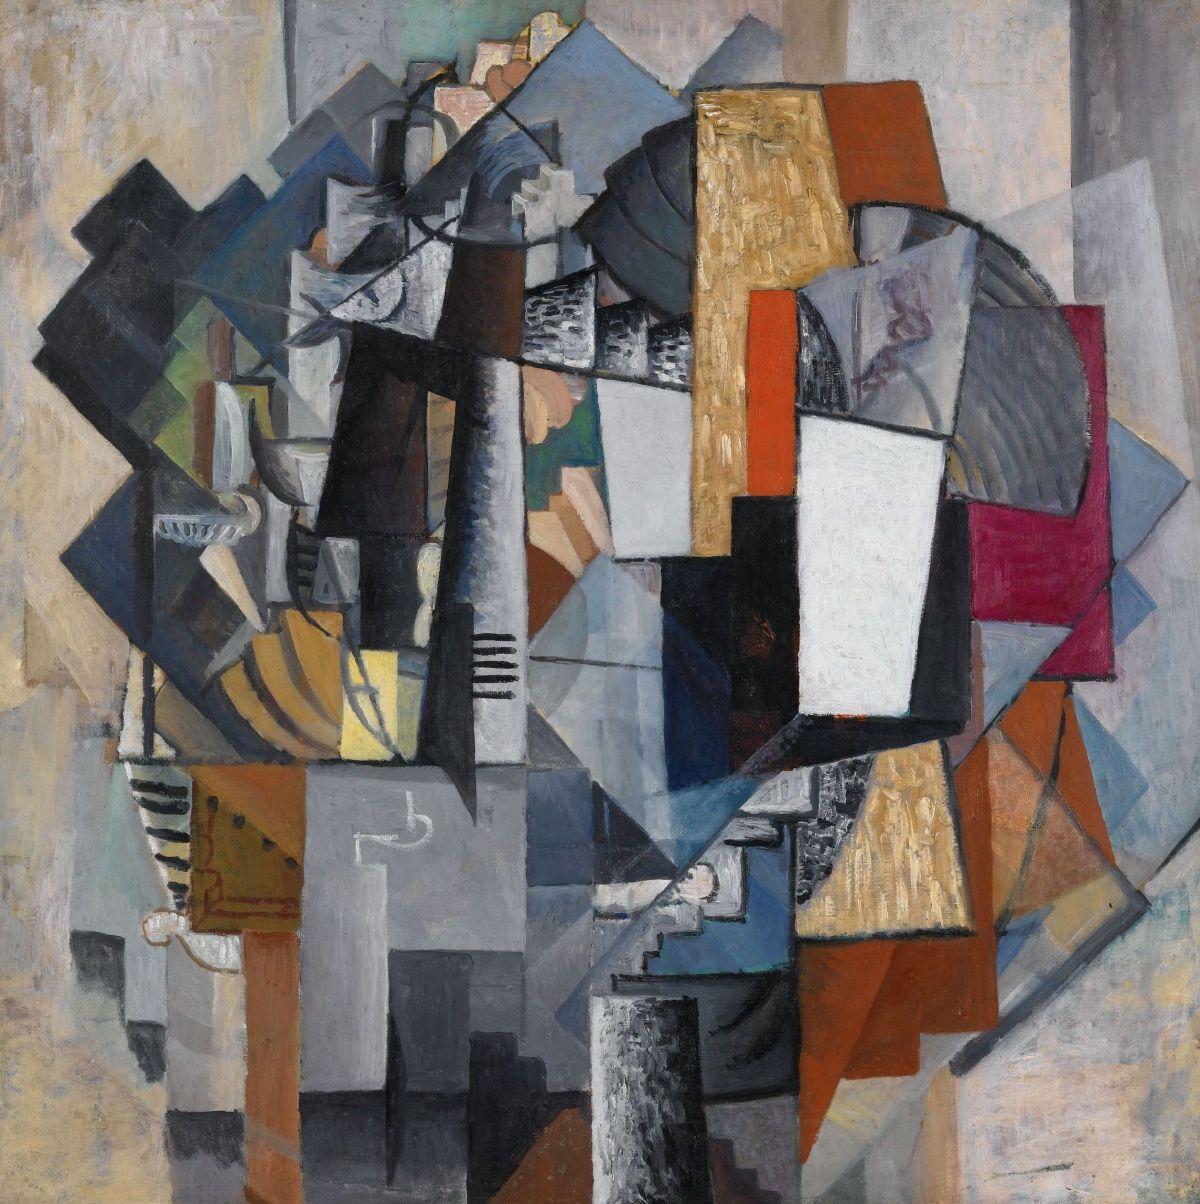 Bureau and Room by Kazimir Malevich